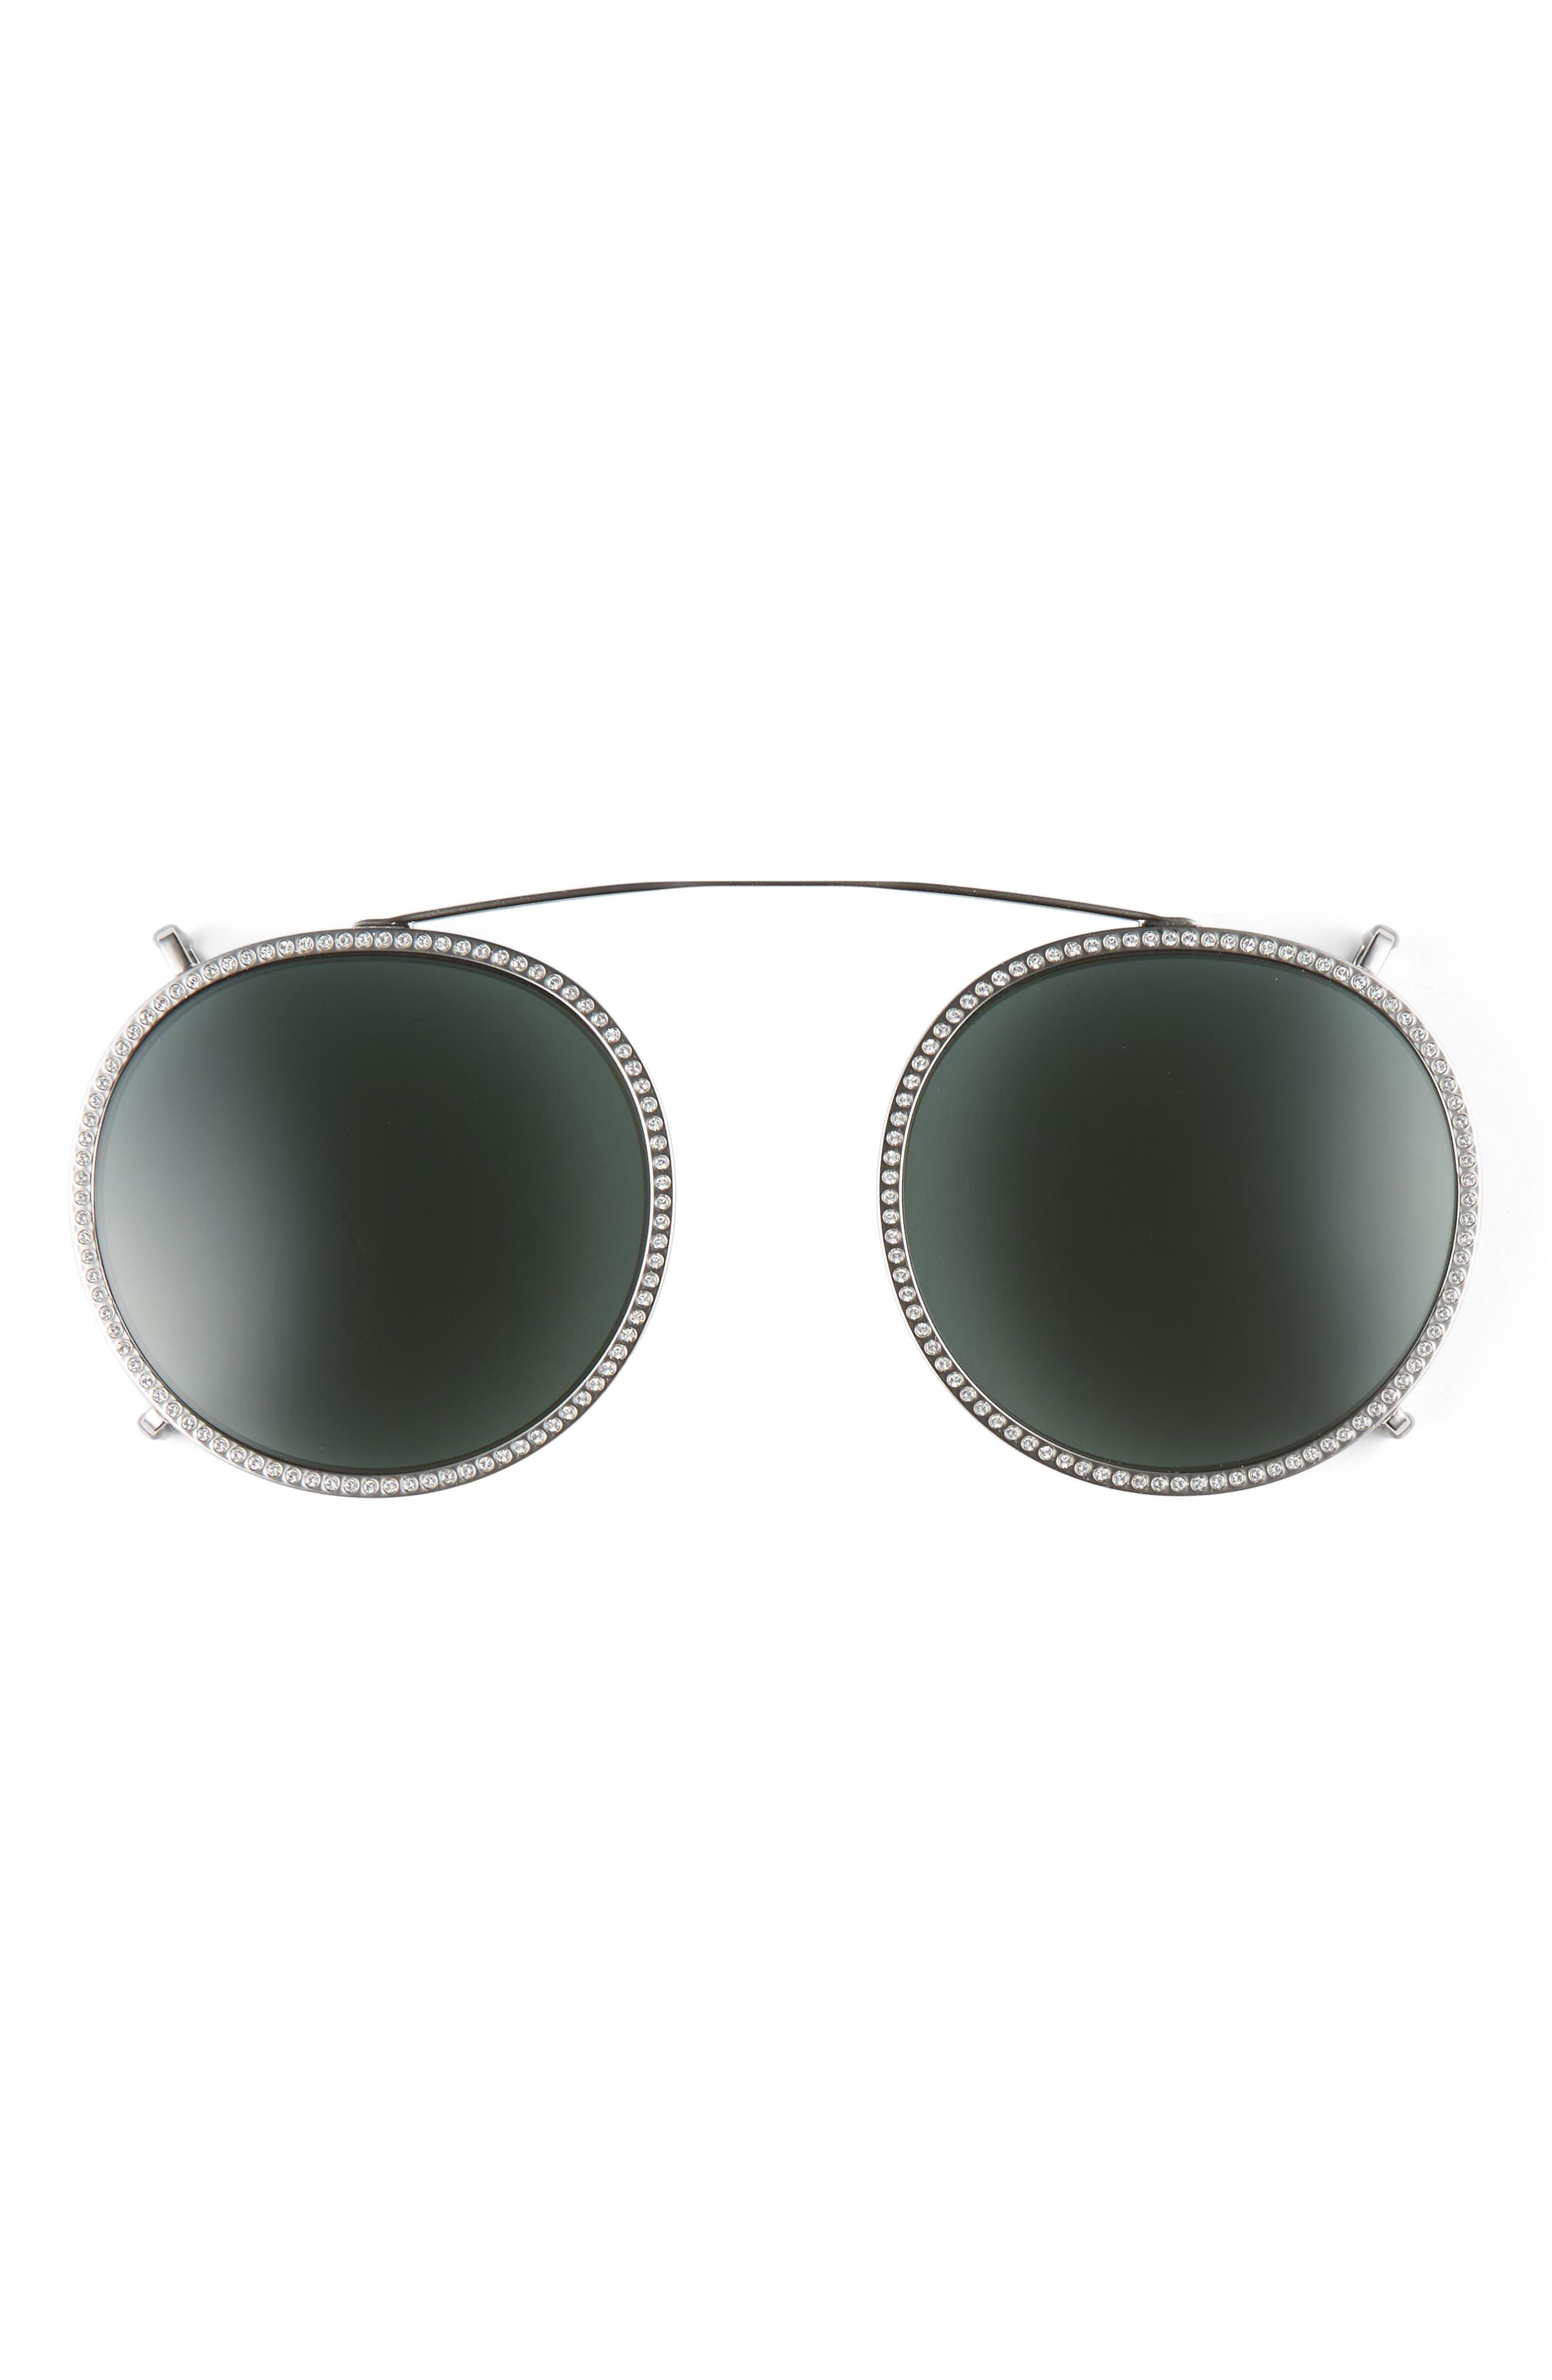 47mm Round Sunglasses,                             Alternate thumbnail 8, color,